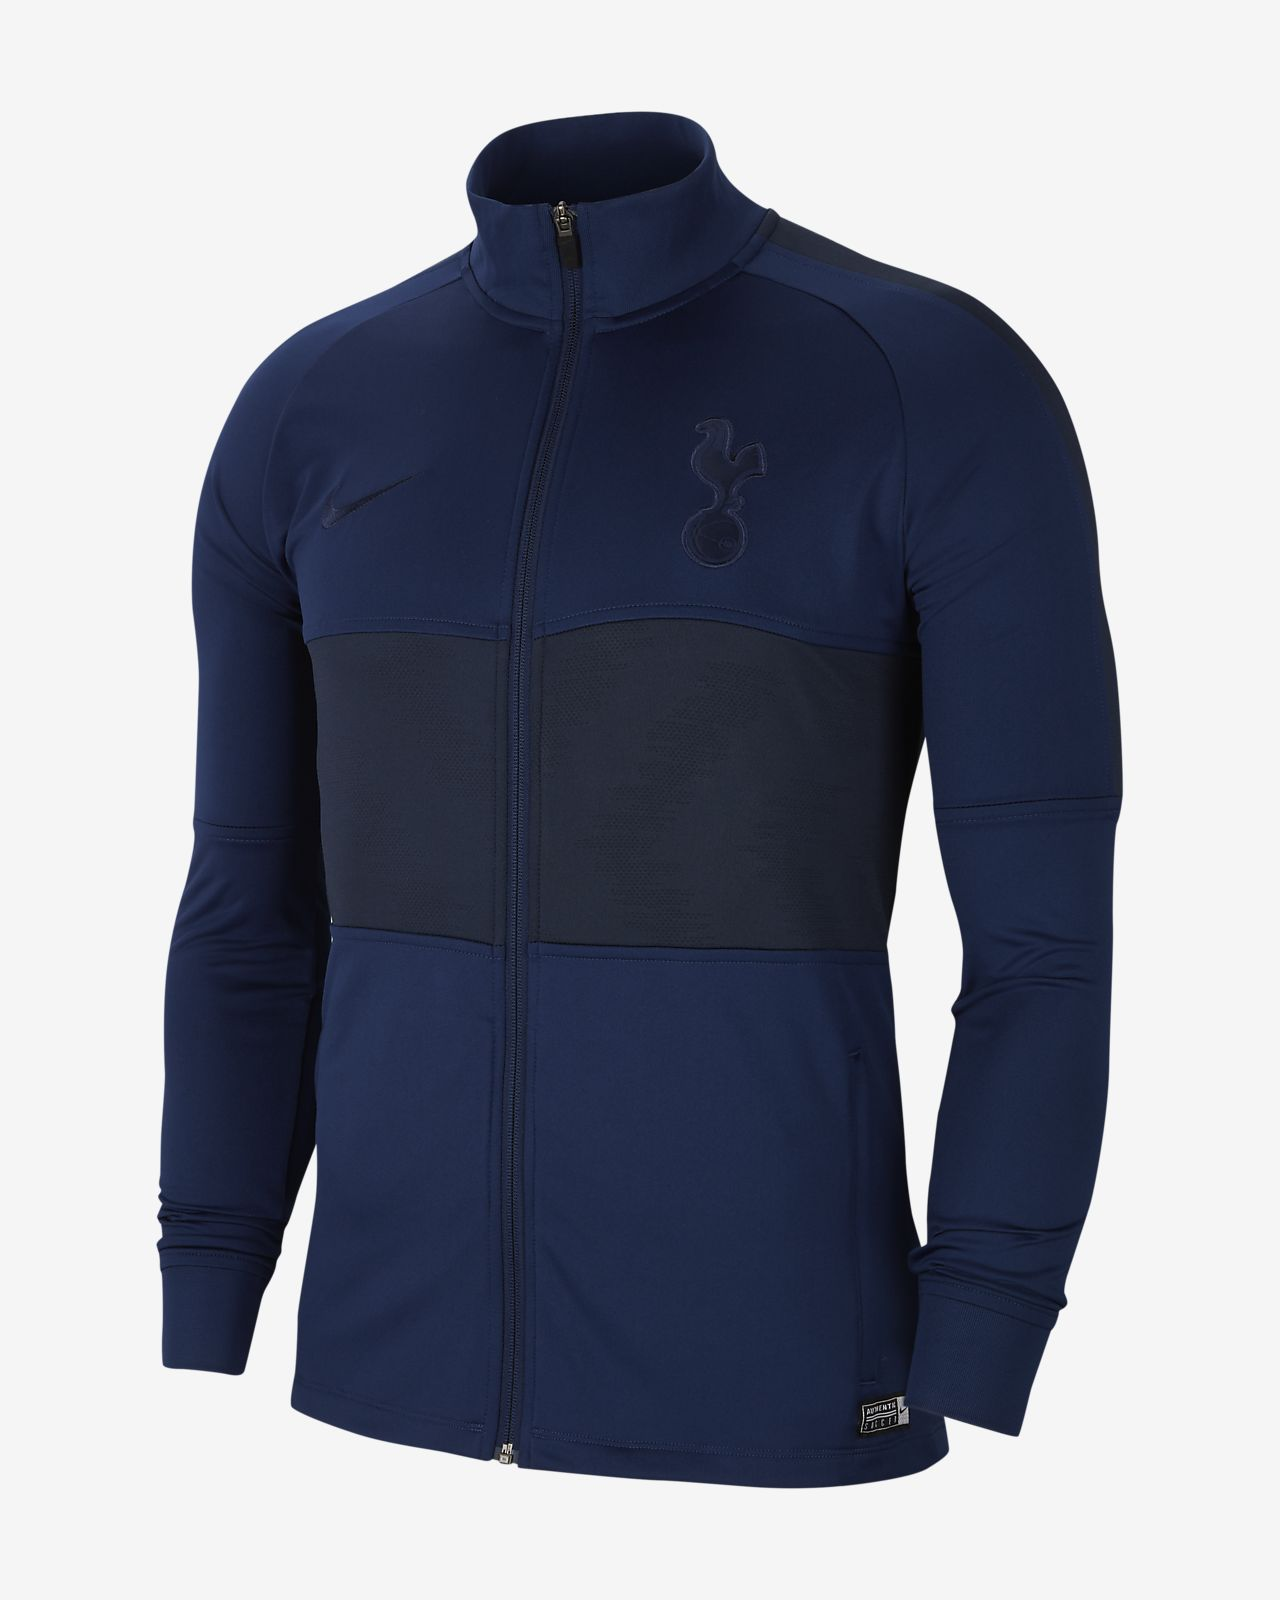 Tottenham Hotspur Strike Men's Football Jacket